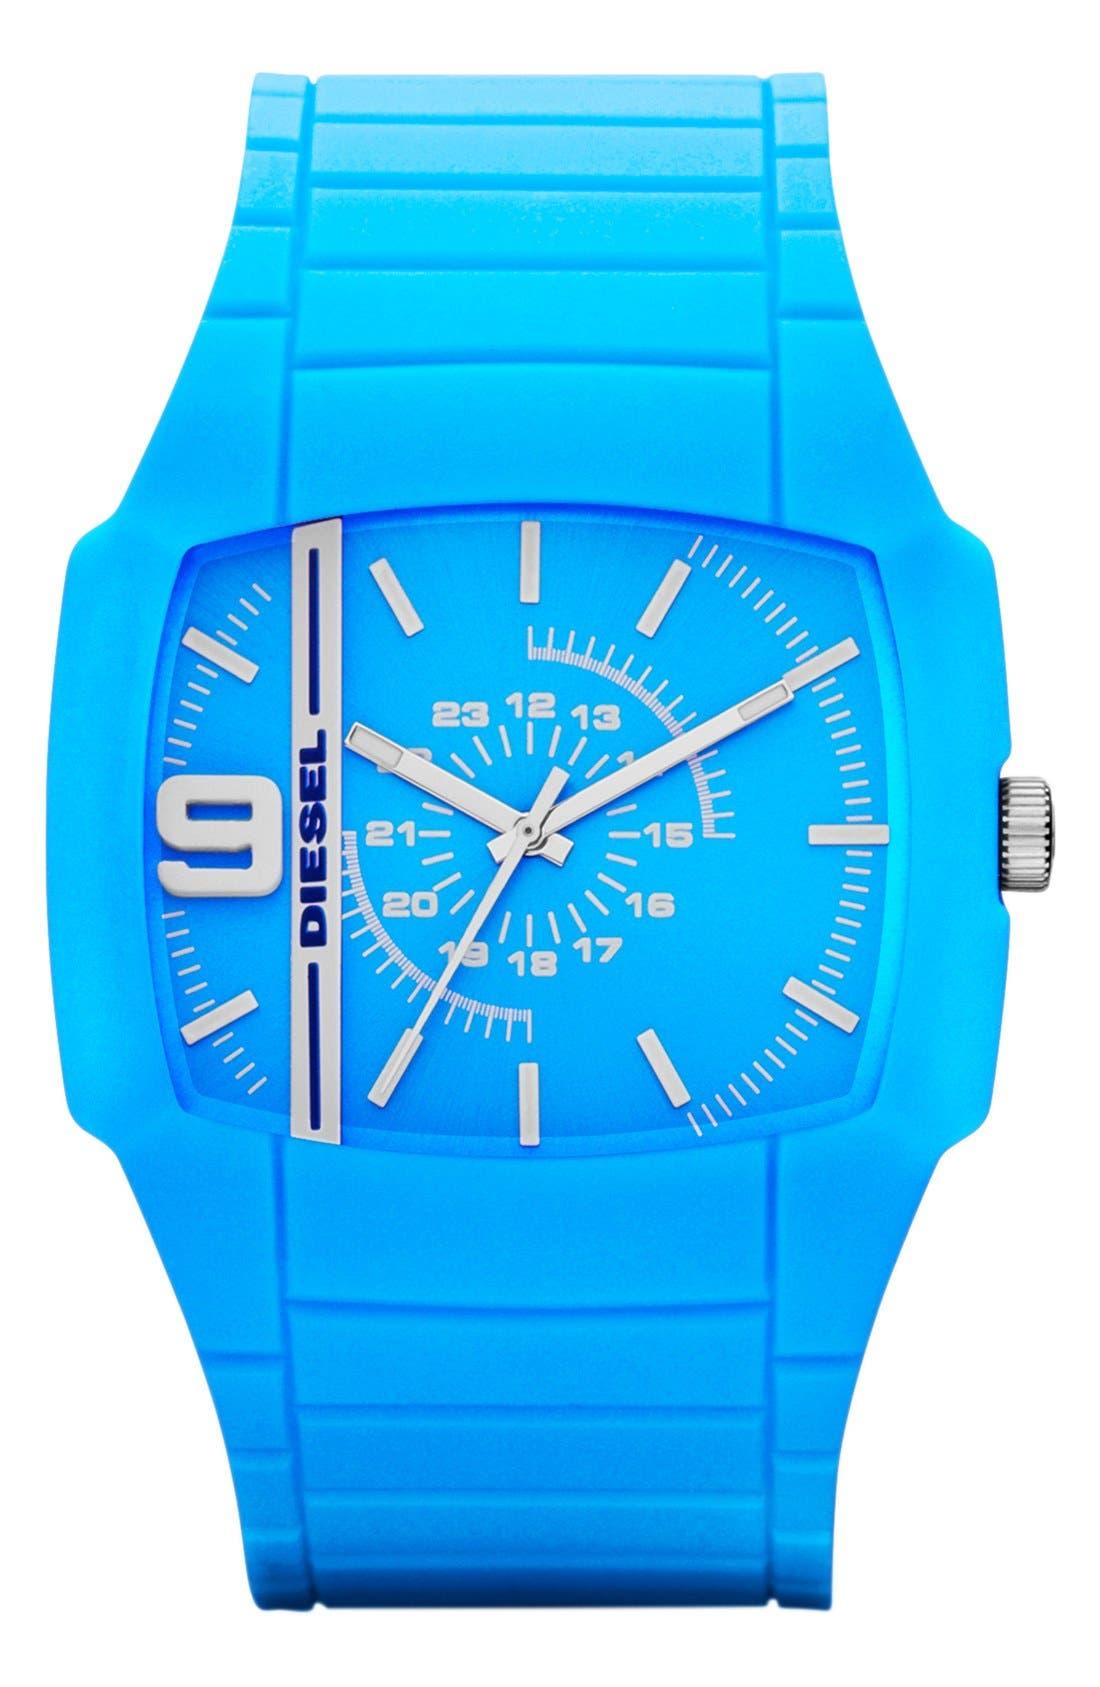 Main Image - DIESEL® 'Trojan' Silicone Strap Watch, 48mm x 43mm